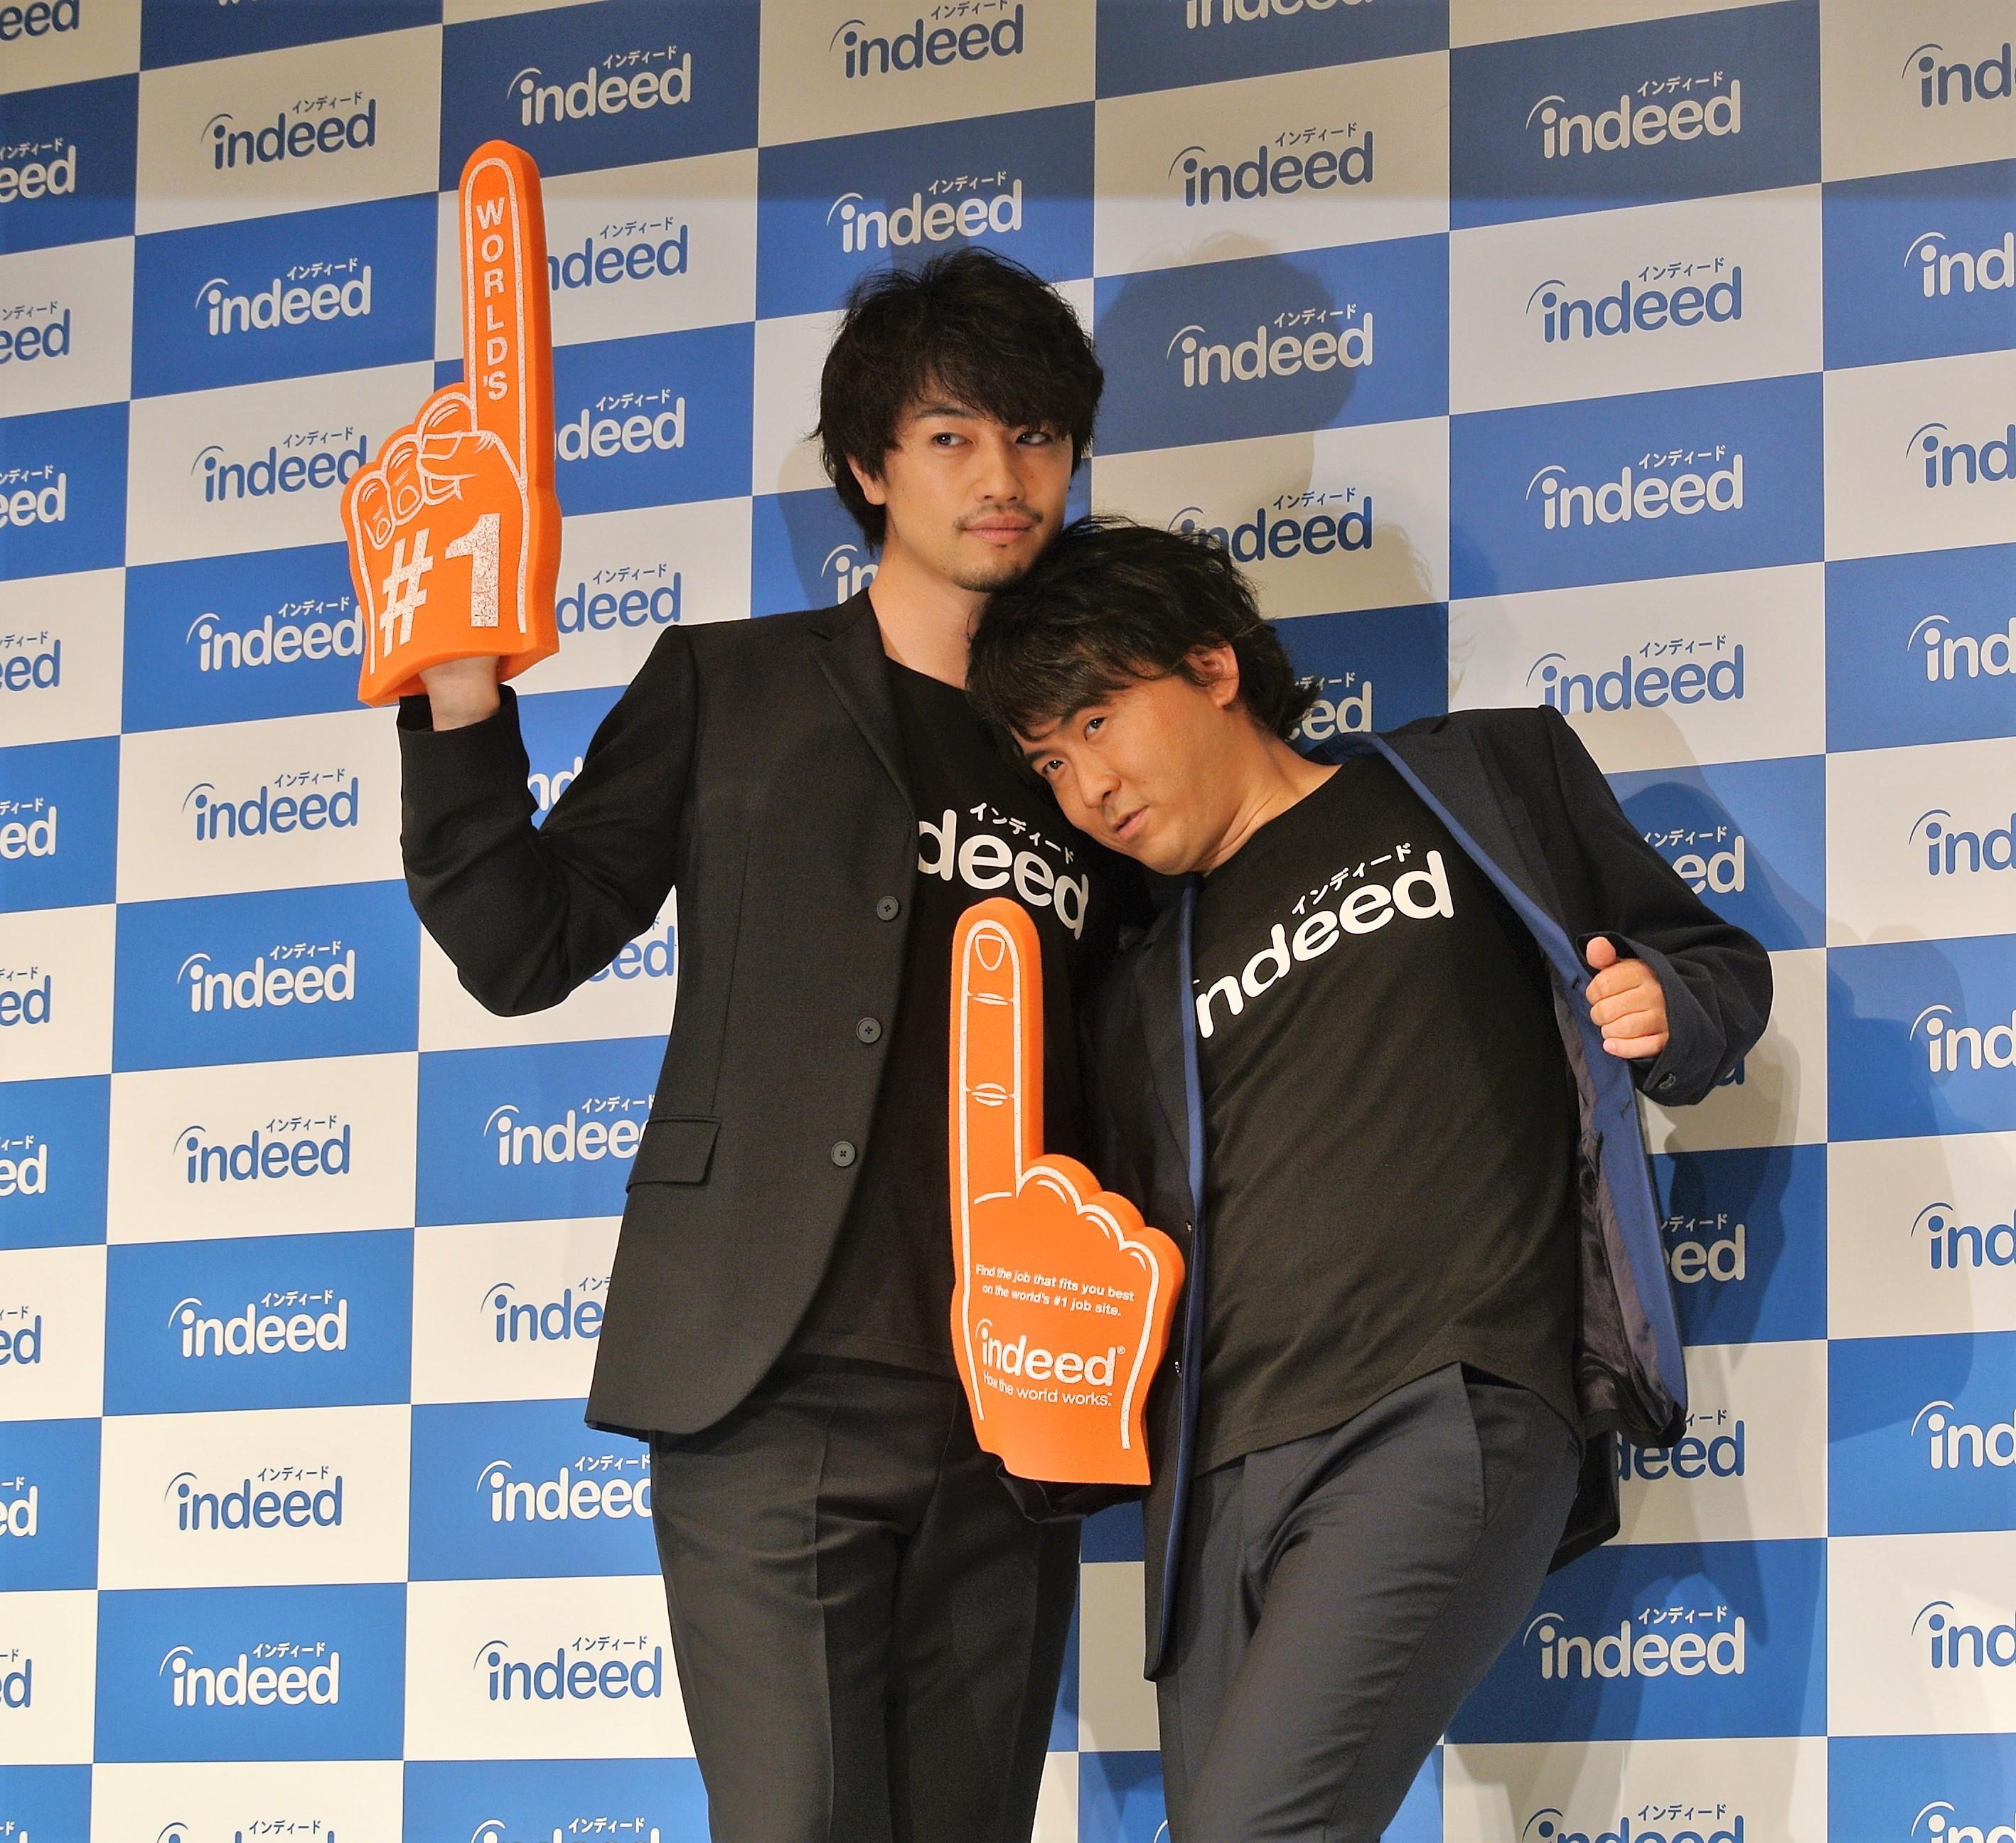 http://news.yoshimoto.co.jp/20170629201204-f6835492cddae53af5fb31aa0ce127b23497288f.jpg